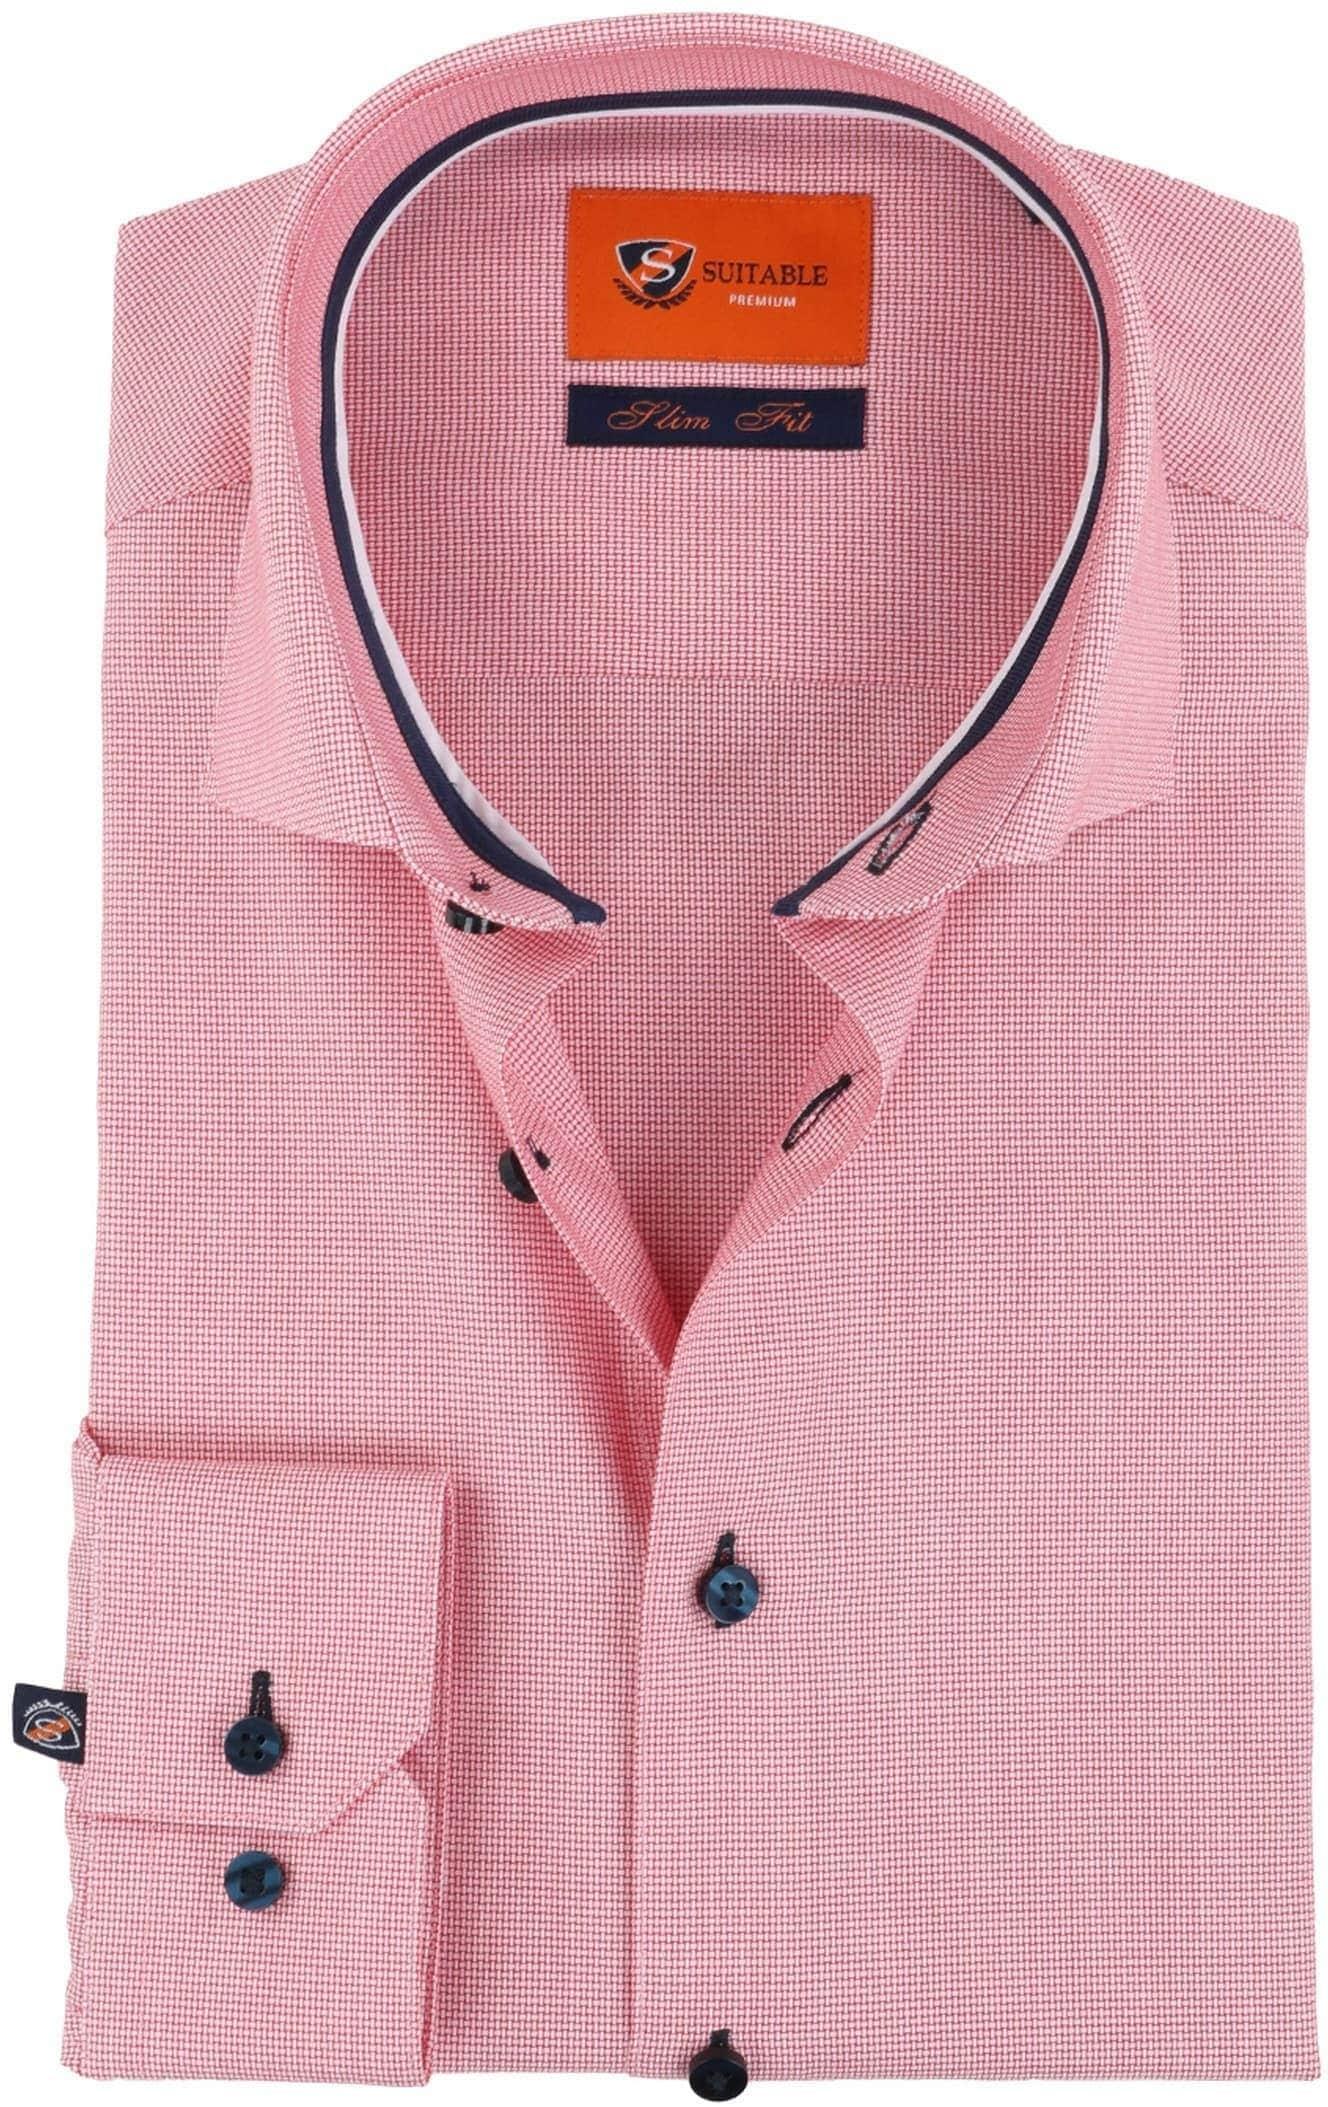 reputable site fb5fb f3355 Suitable Hemd Panama Rot D81-03 online kaufen | Suitable